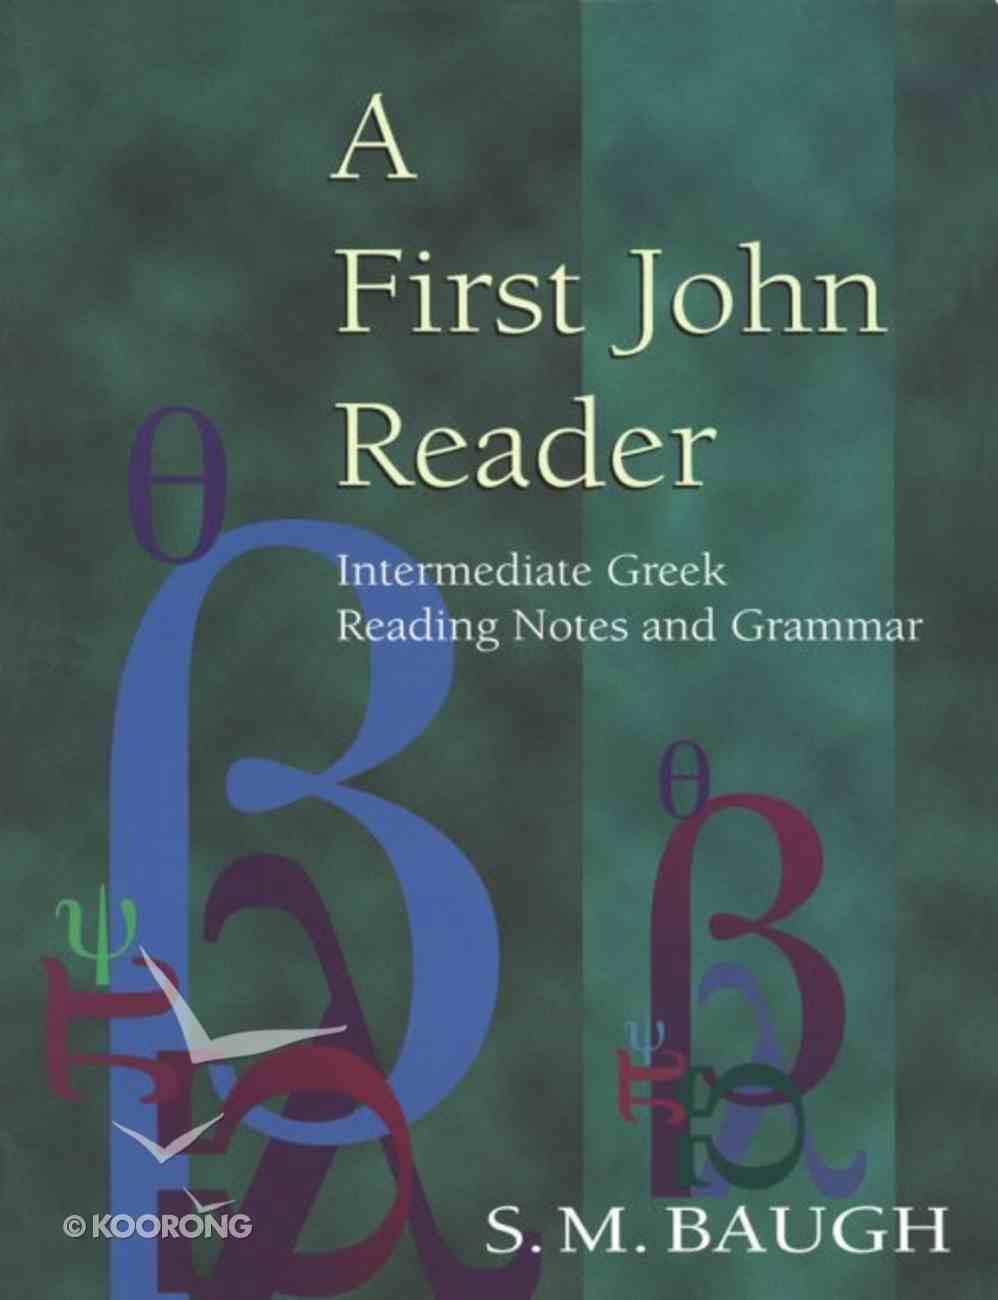 First John Reader Intermediate Greek Reading Notes and Grammar Paperback